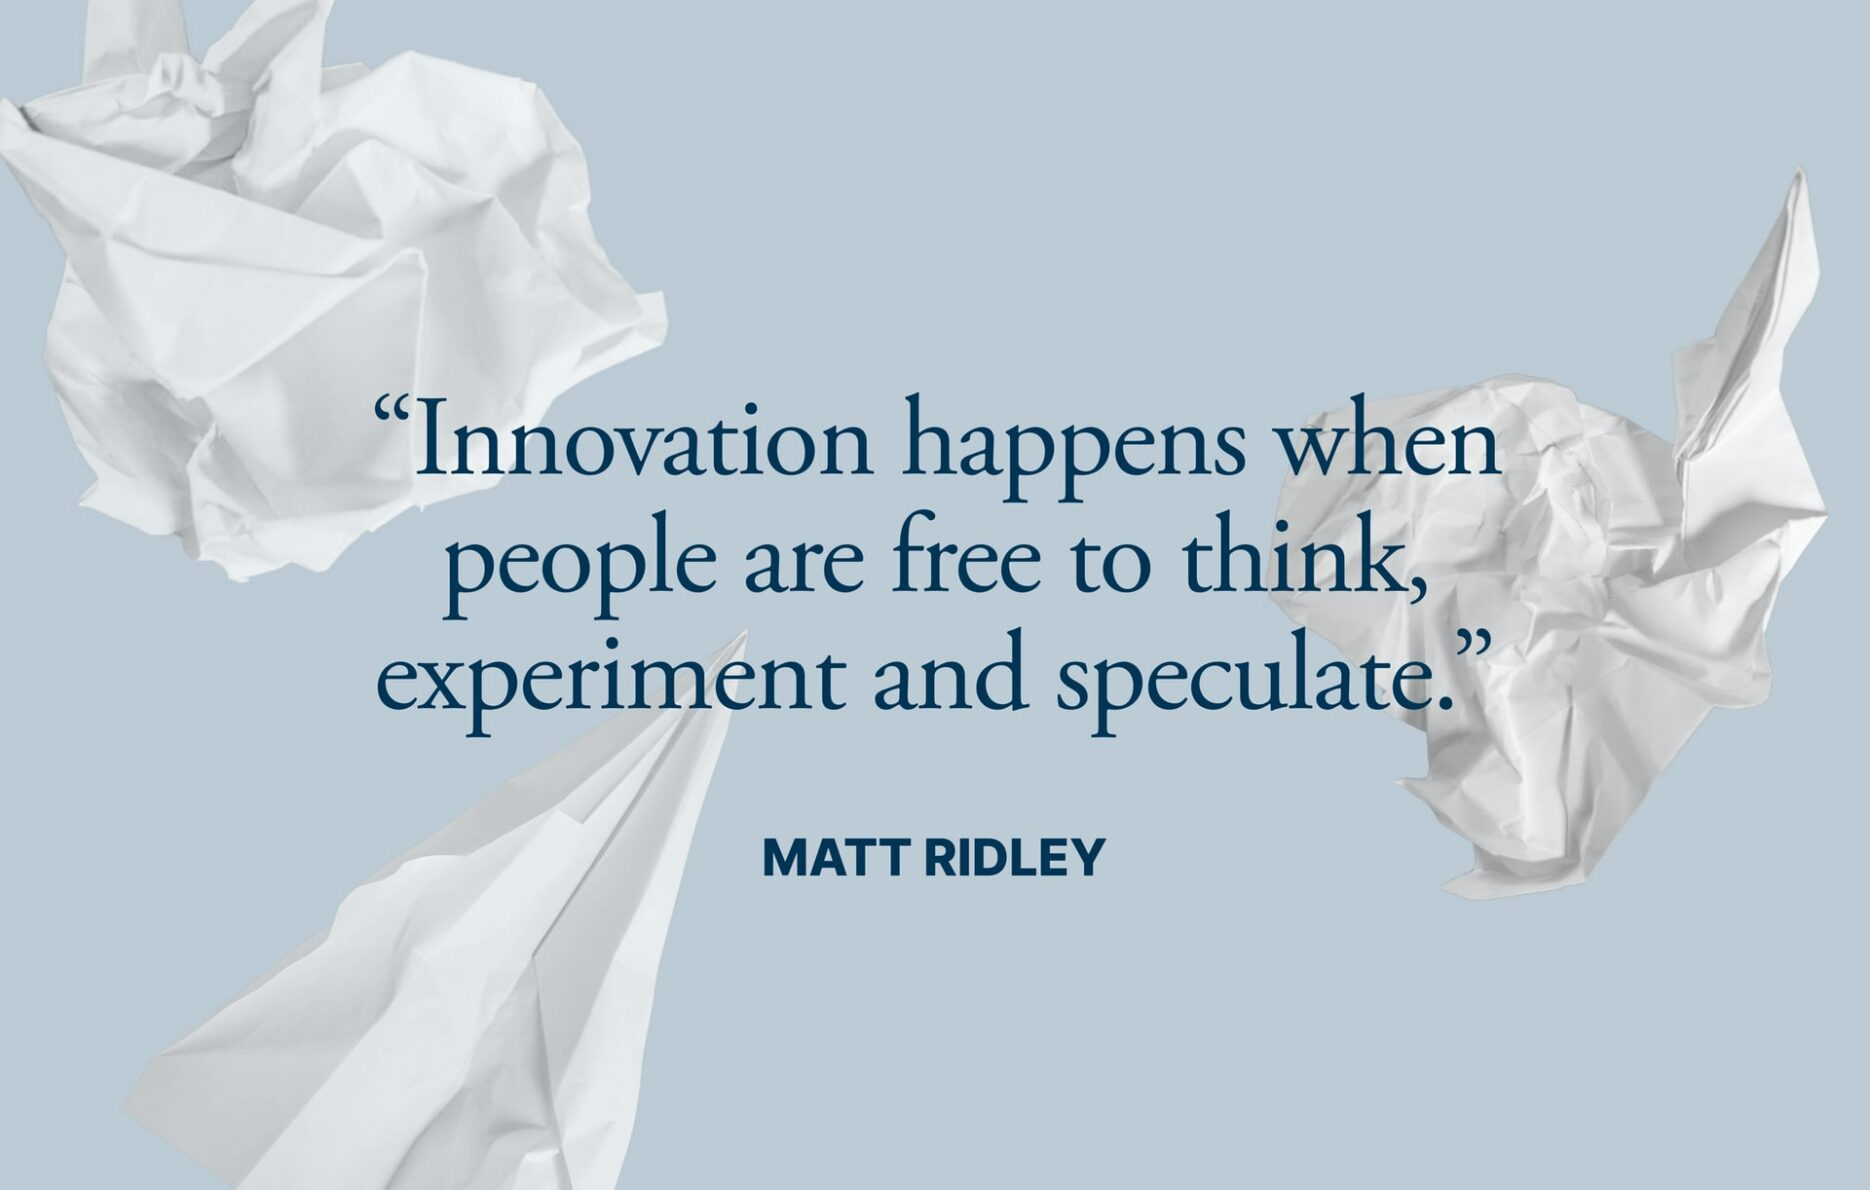 Know-how und Innovation